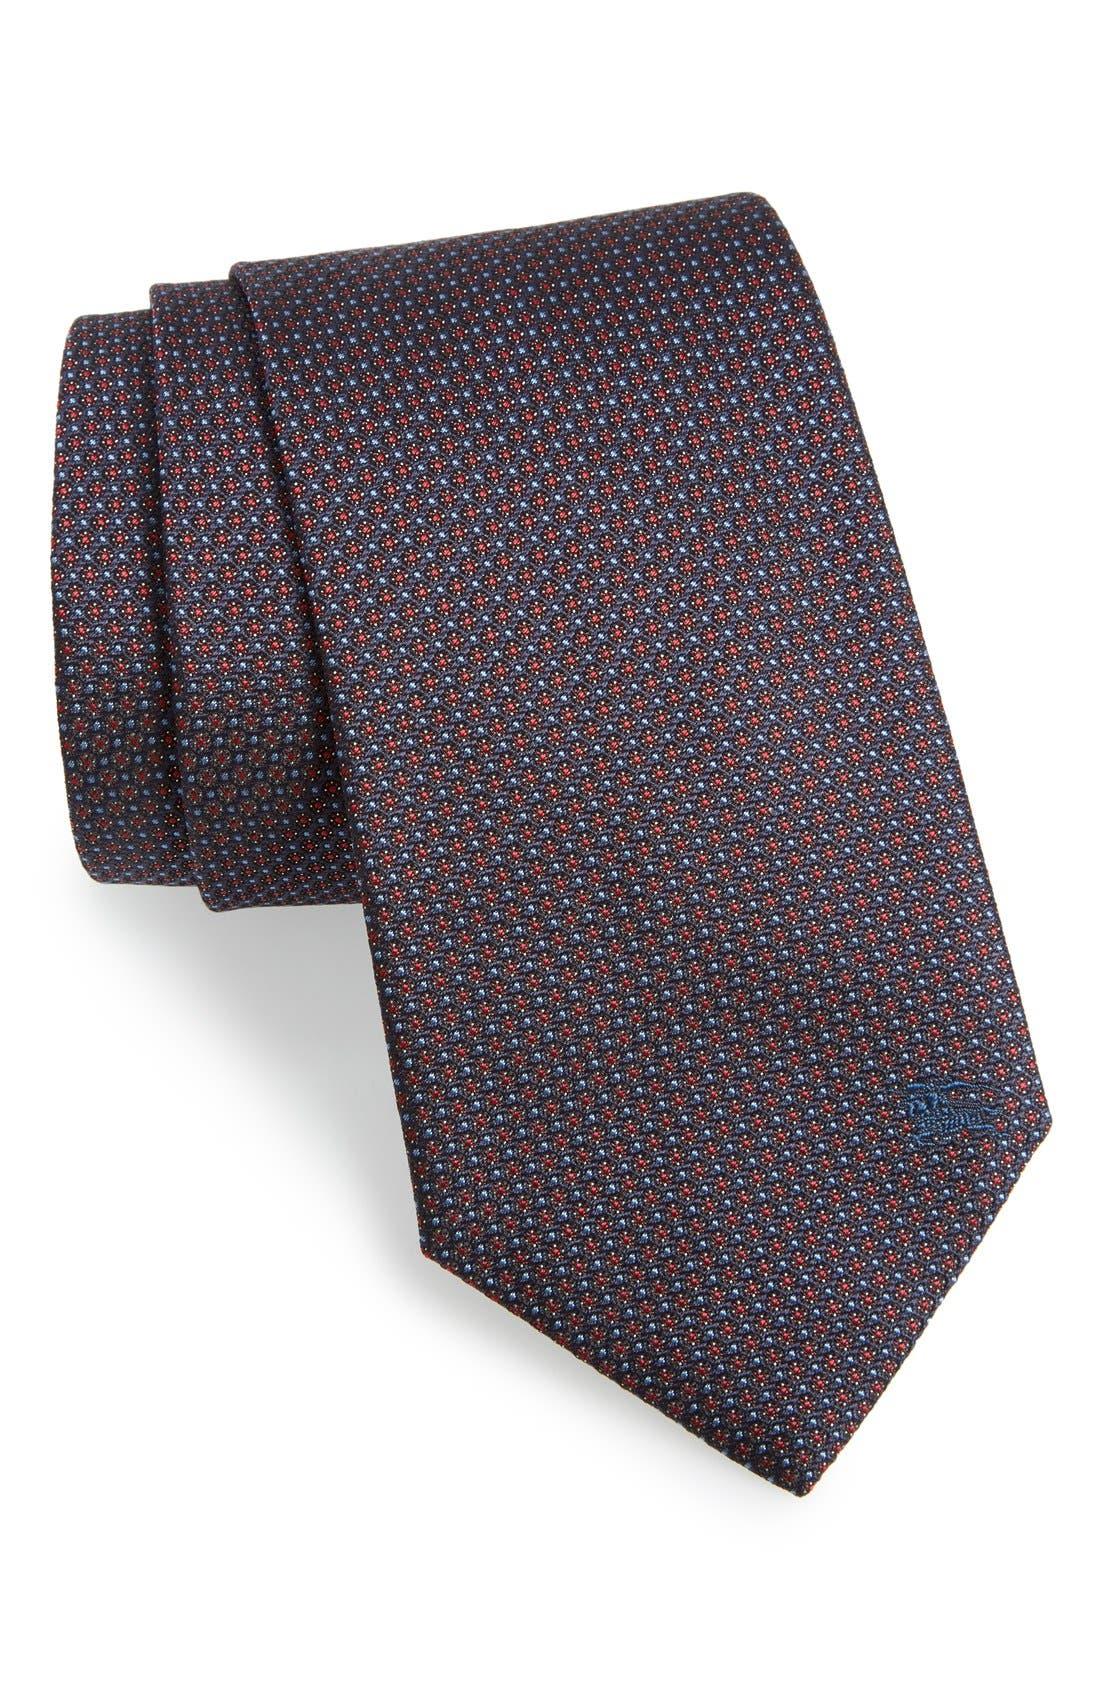 London 'Clinton' Medallion Silk Tie,                             Main thumbnail 2, color,